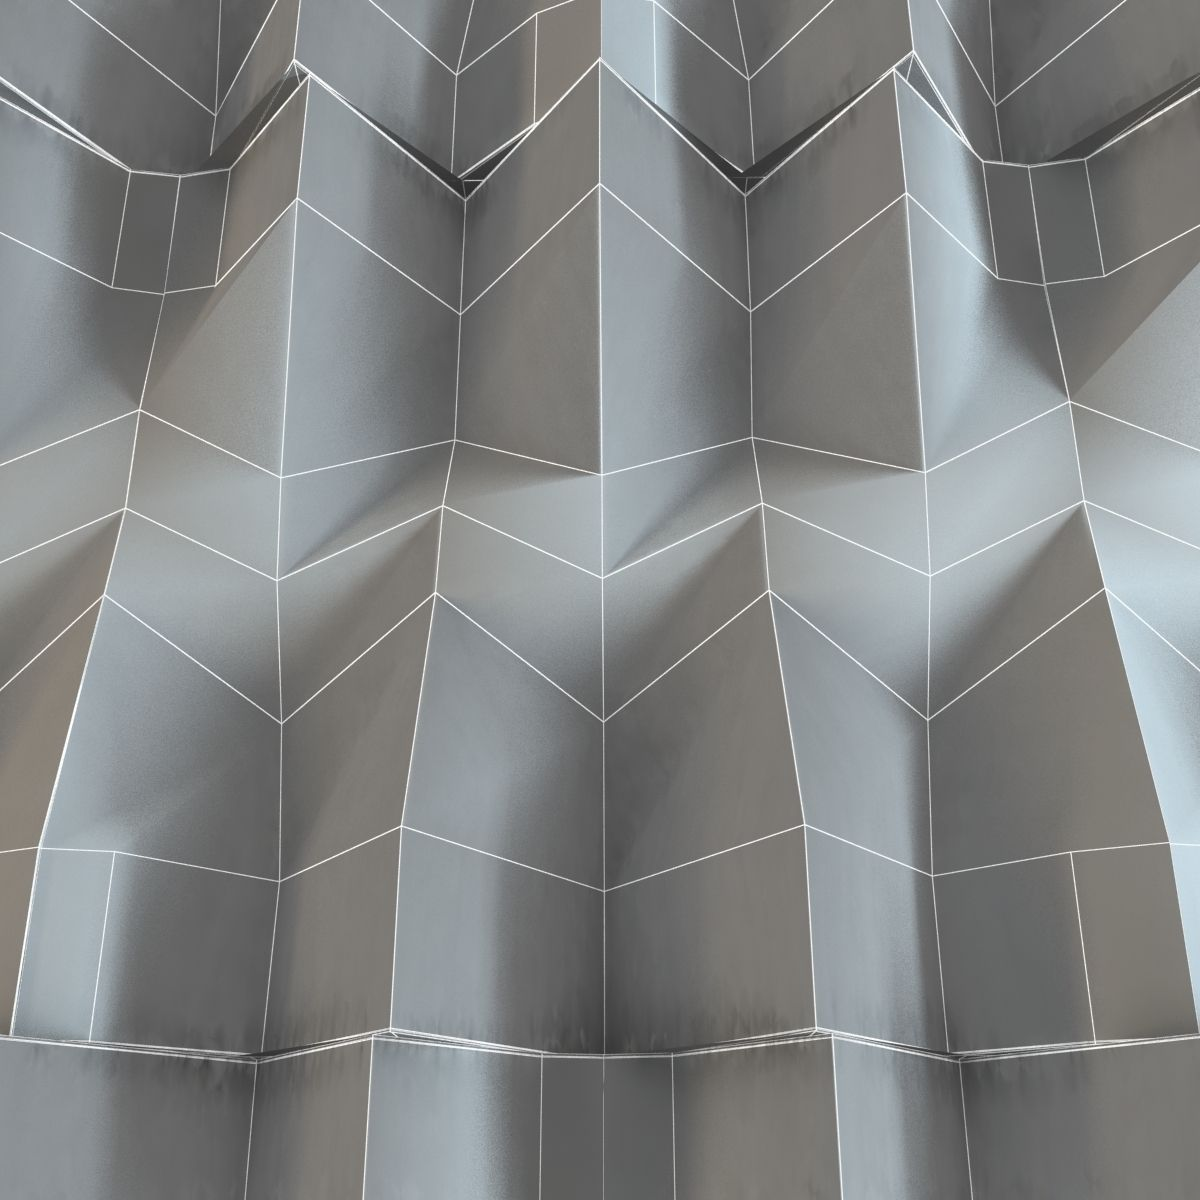 Lithos 3d Wall Tiles Tulle Model Max Obj 3ds Fbx Mtl Unitypackage 4